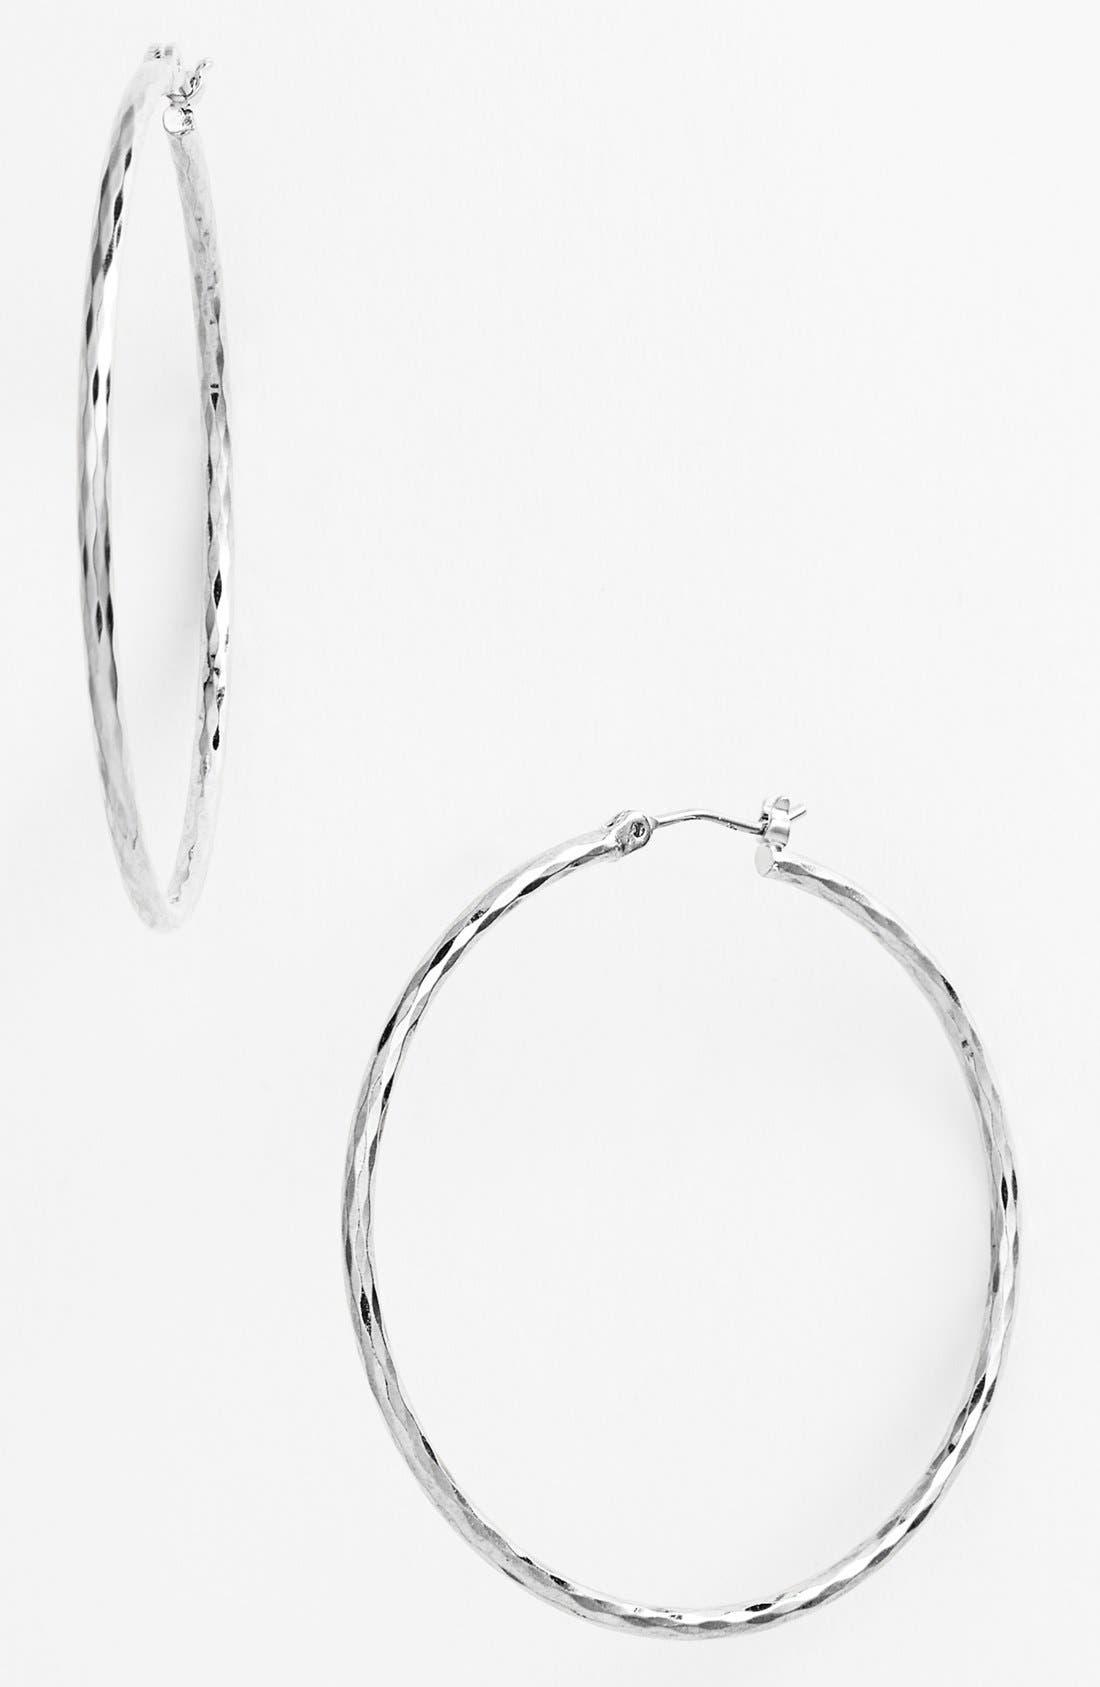 Harlequin Facet Hoop Earrings,                             Main thumbnail 1, color,                             040